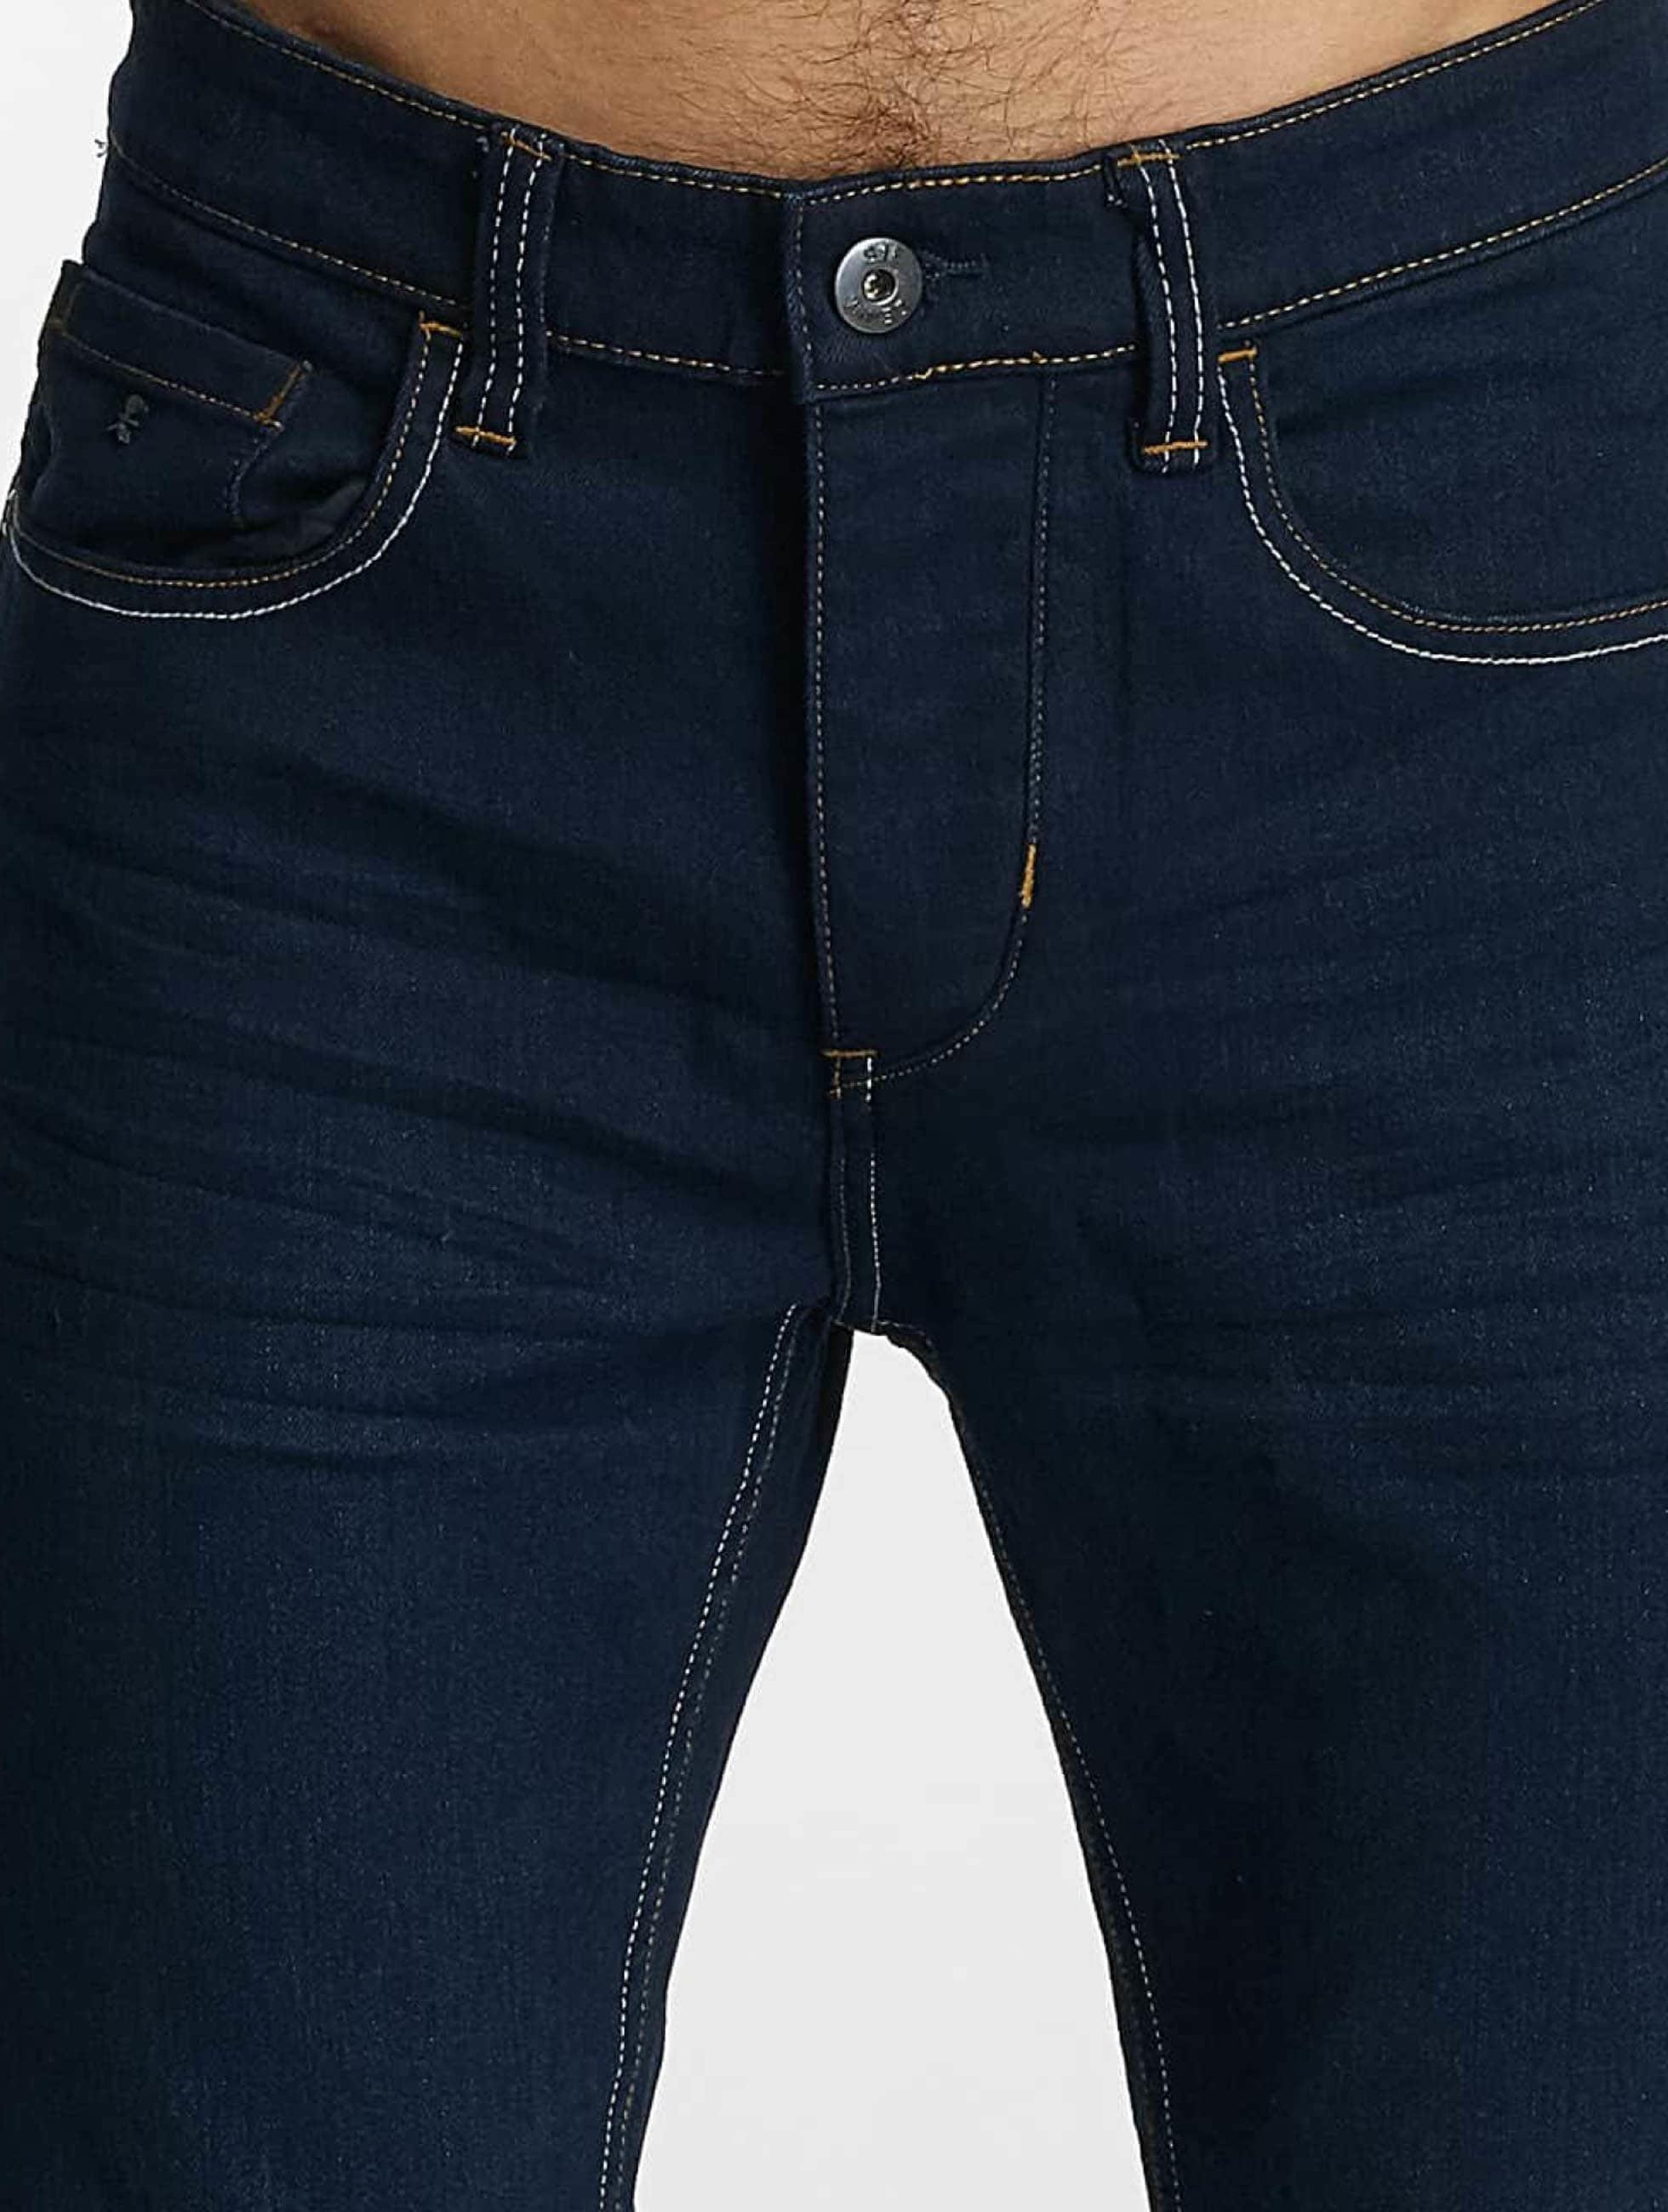 Paris Premium Dżinsy straight fit Till niebieski